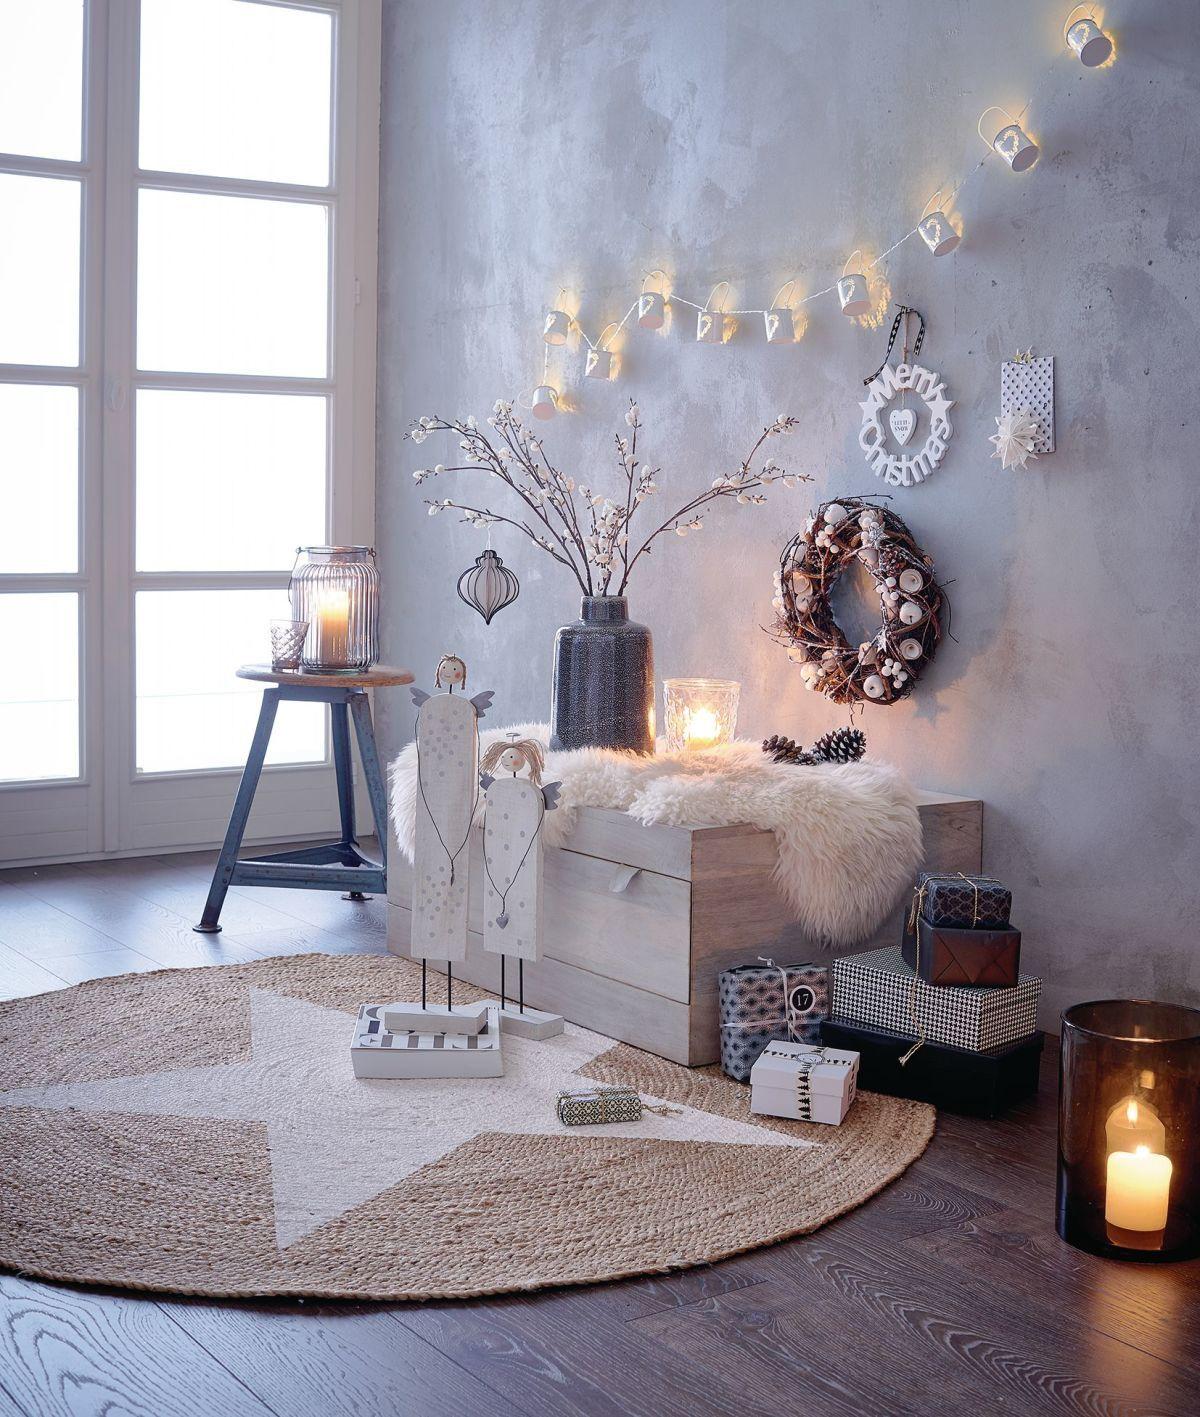 couchtisch integrierte schublade mango massiv couchtische tische m bel living deko. Black Bedroom Furniture Sets. Home Design Ideas